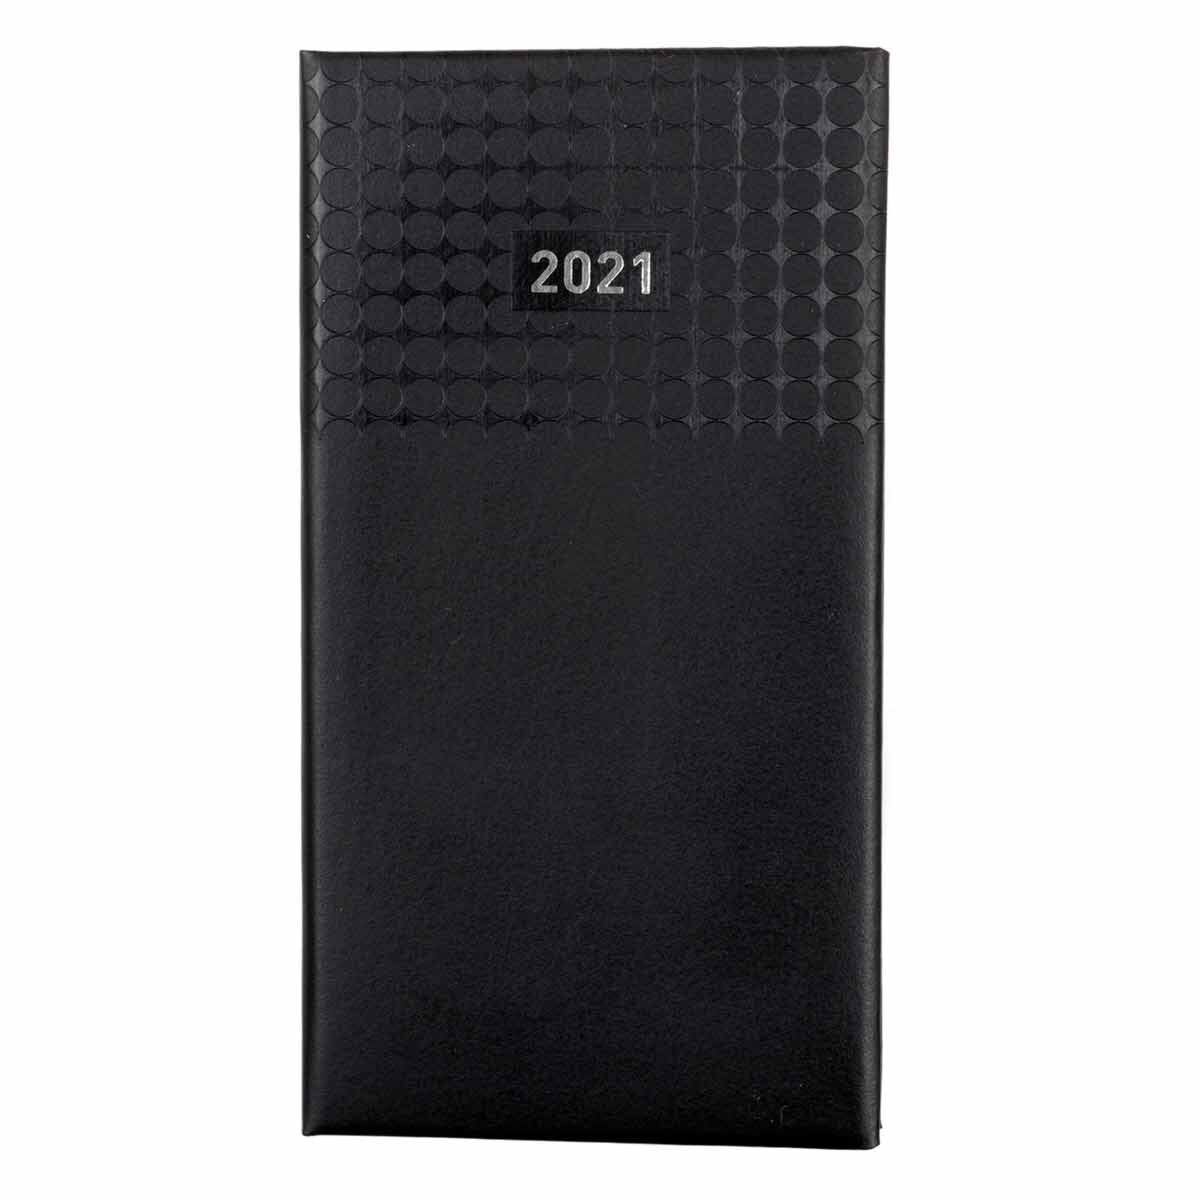 Ryman Langham Diary 2 Weeks to View Slim 2021 Black